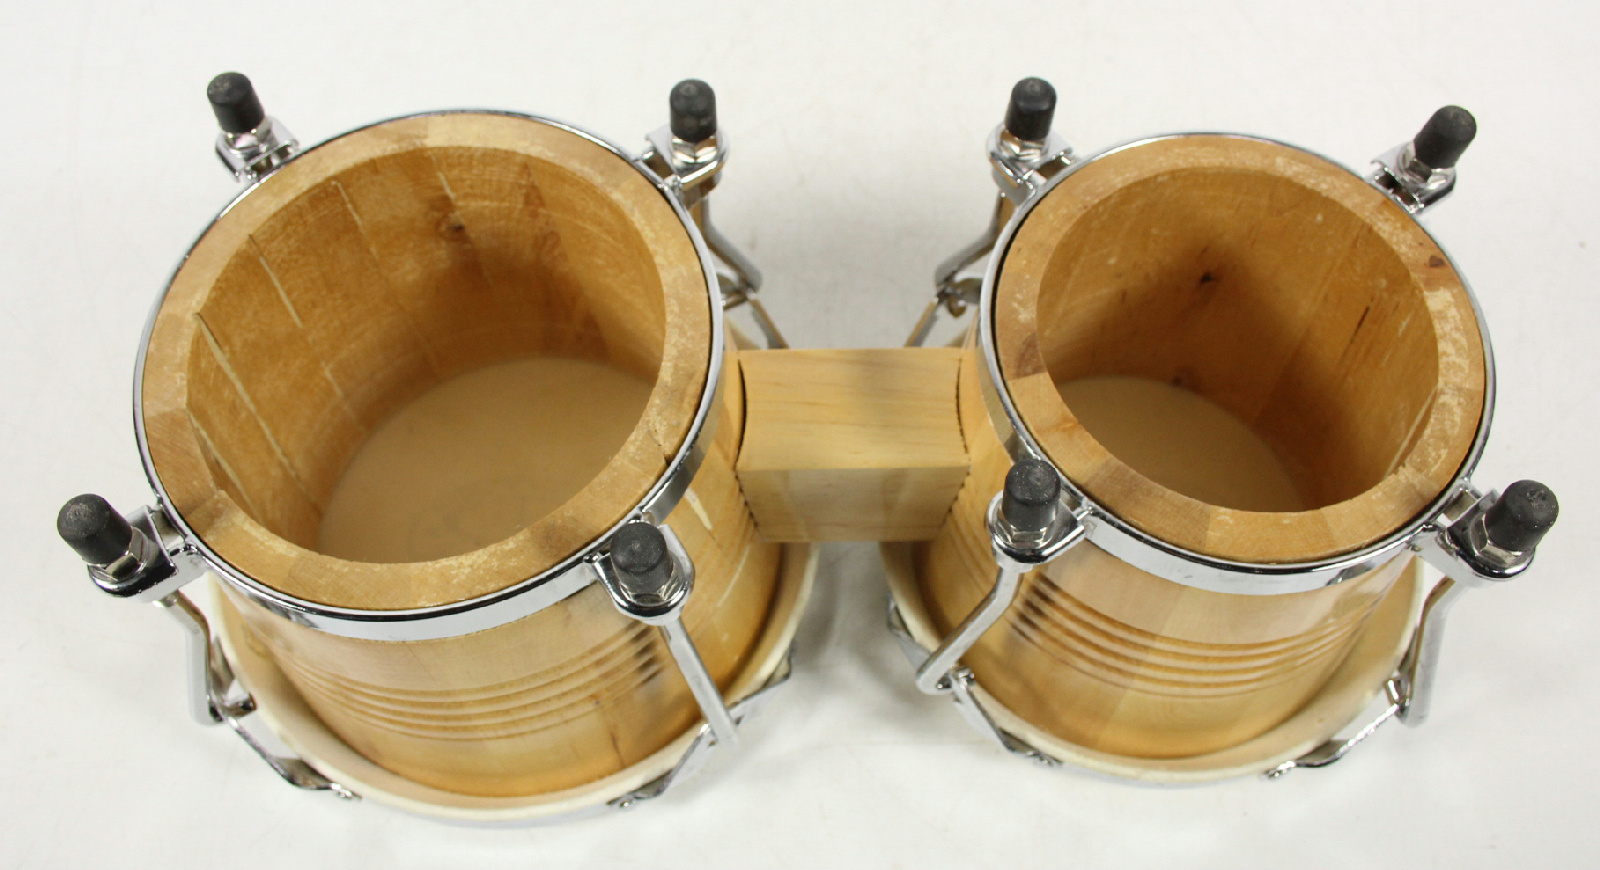 Gp purcession wood bongo drums ebay